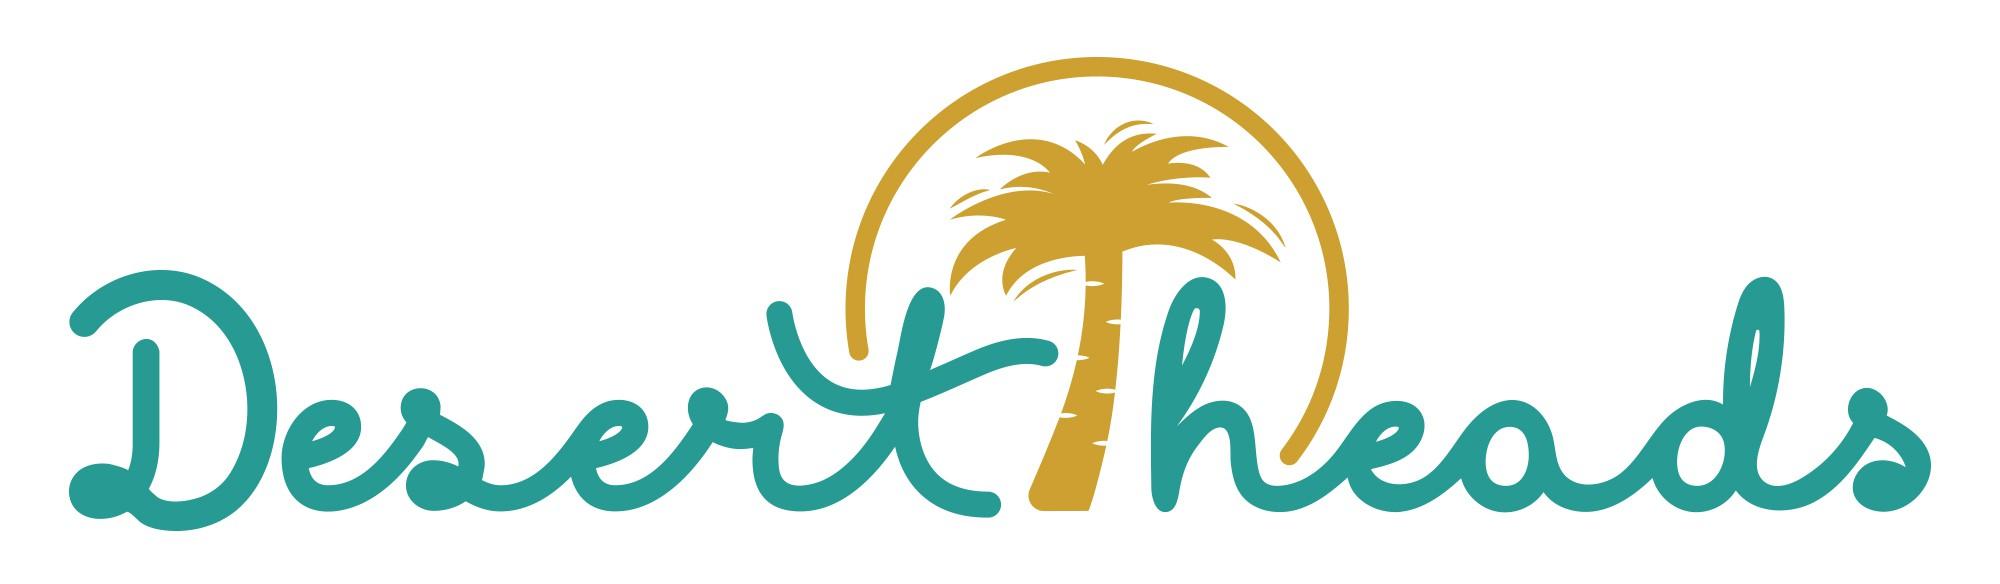 Design a cute Family friendly brand logo